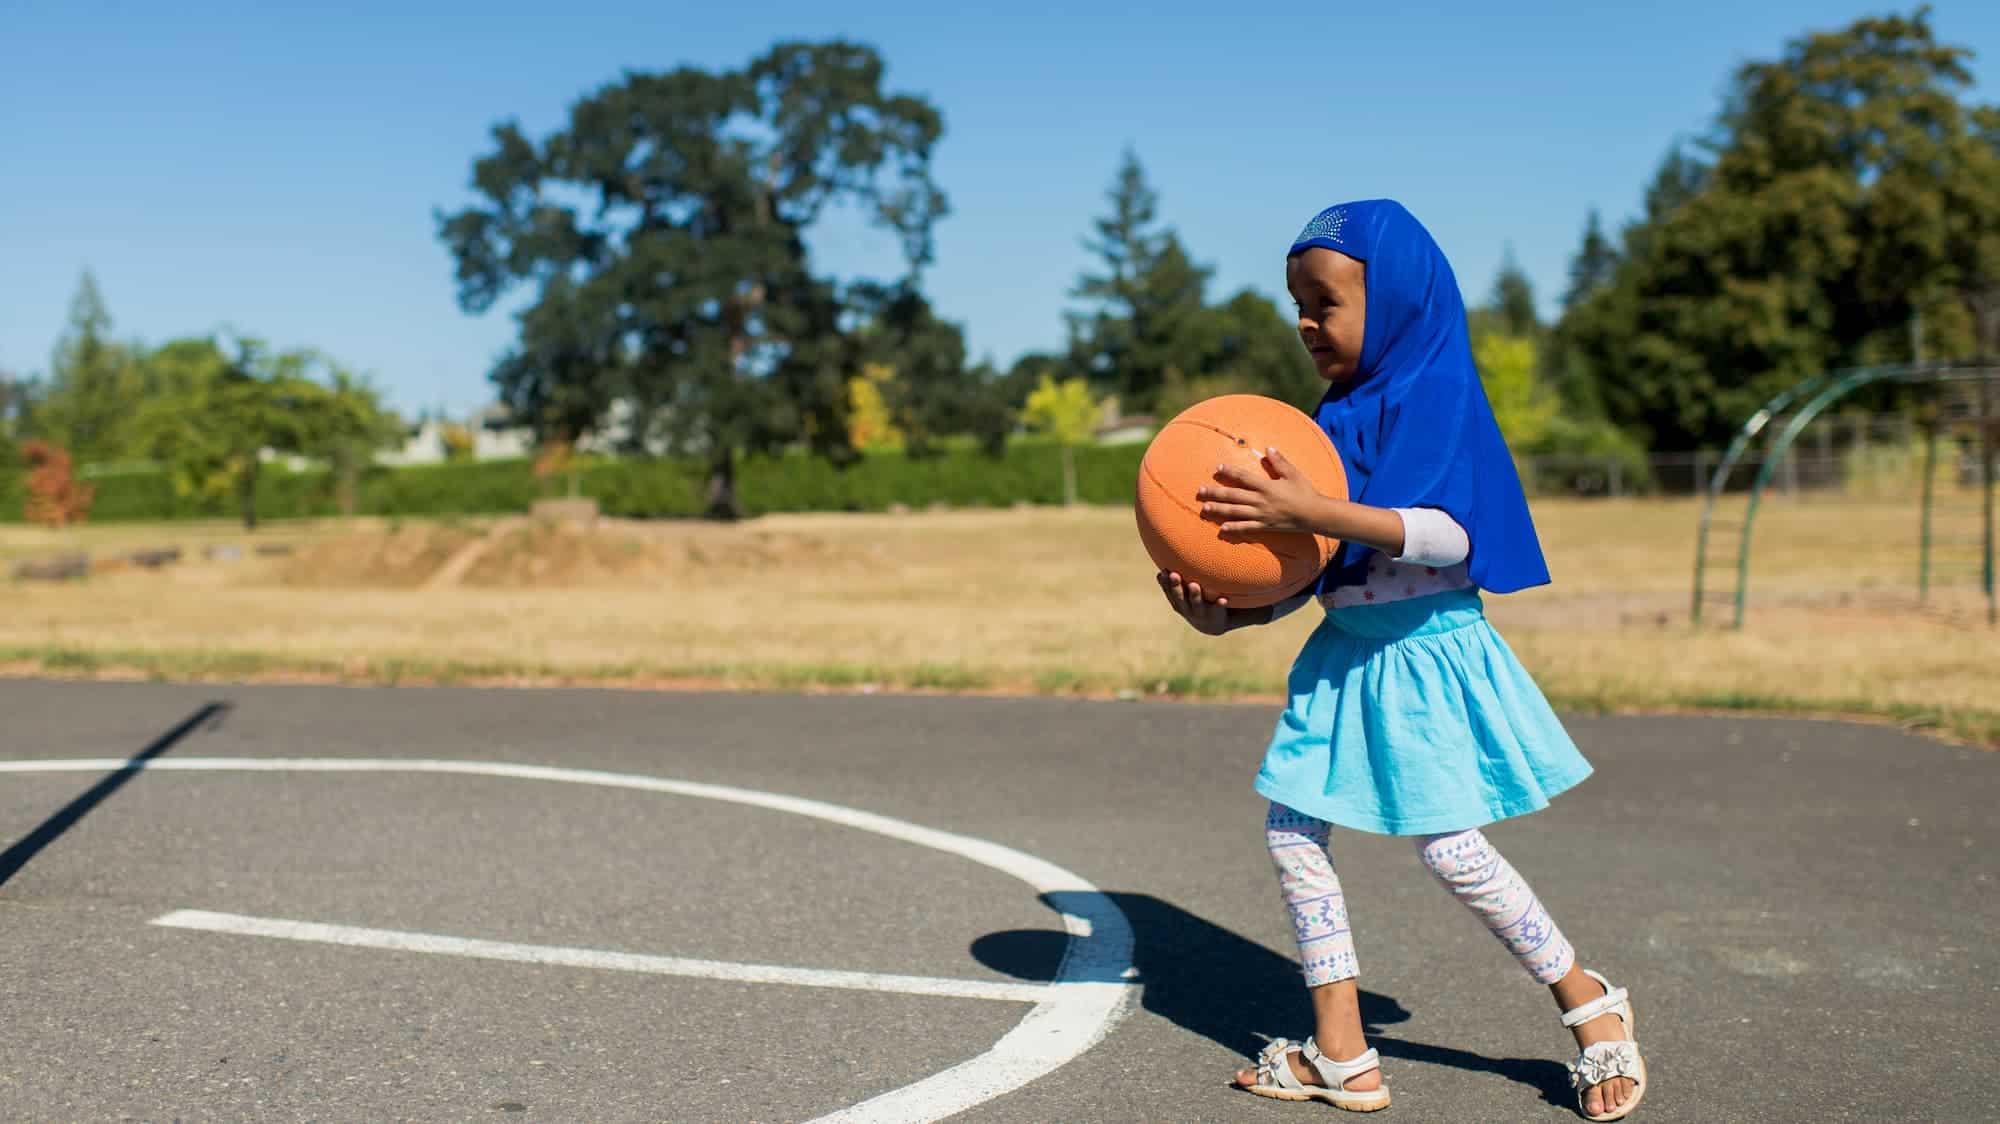 petite fille avec basket-ball